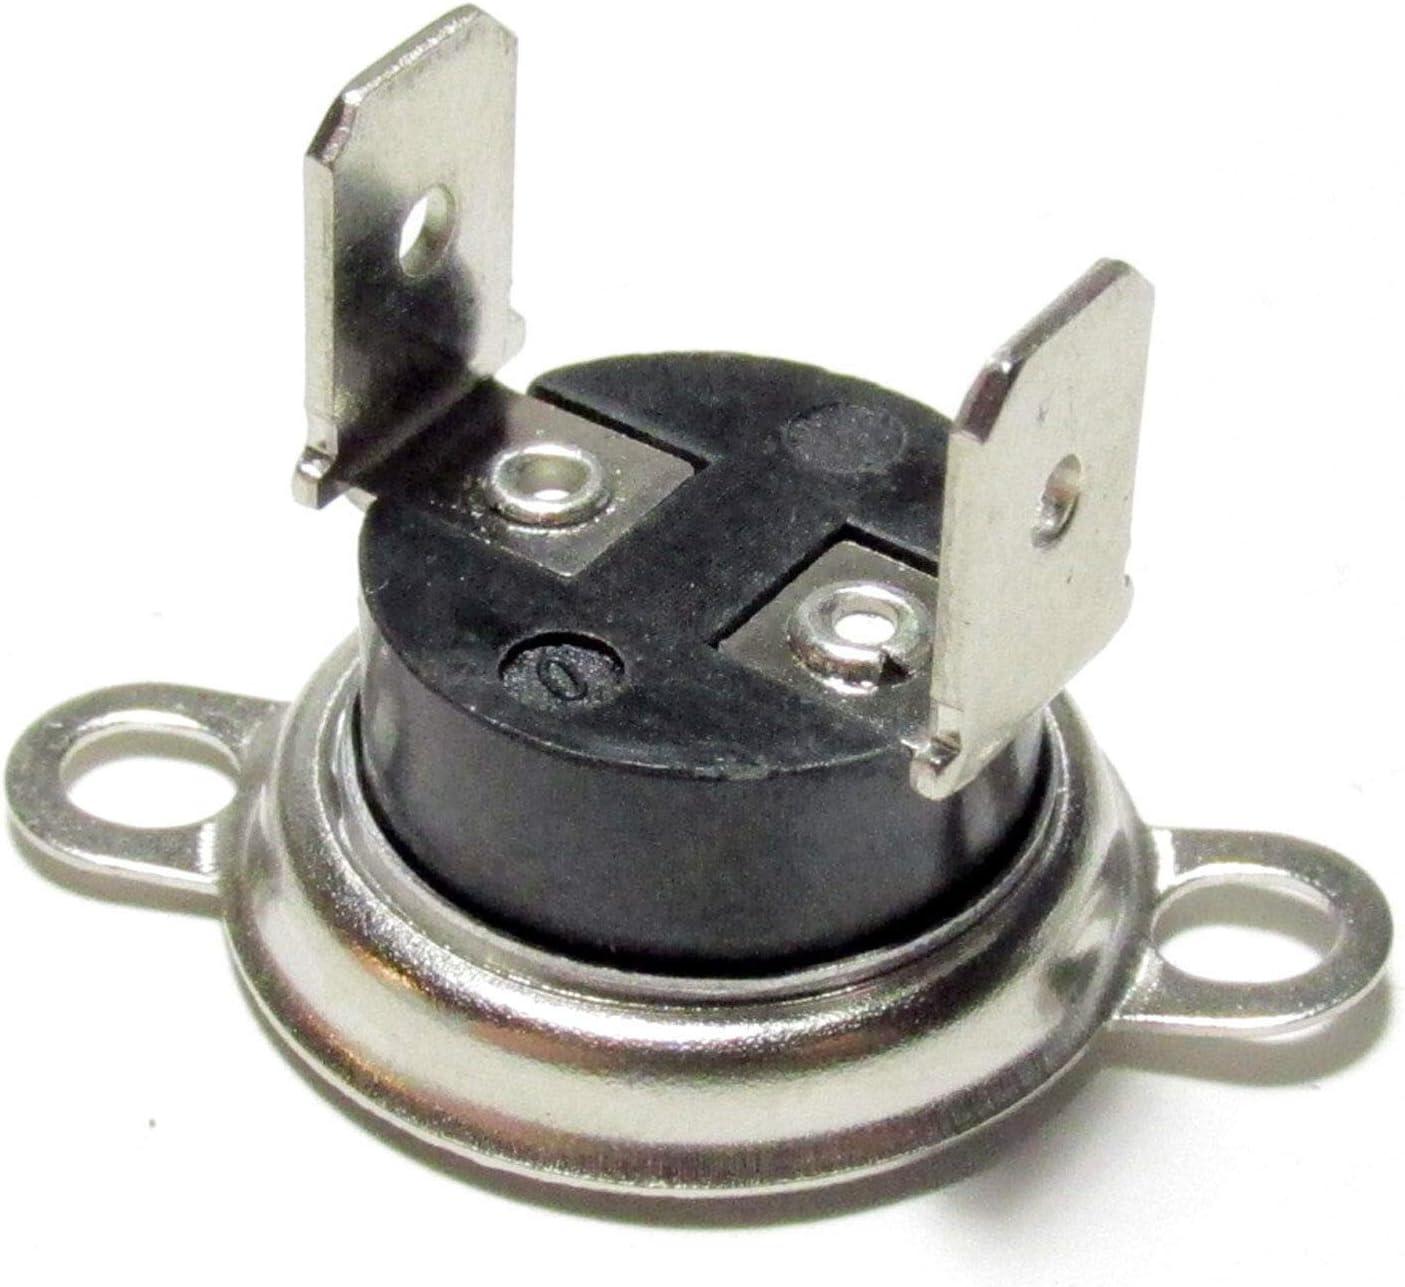 134120900 Dryer Thermal Fuse Limiter für Frigidaire Electrolux Kenmore